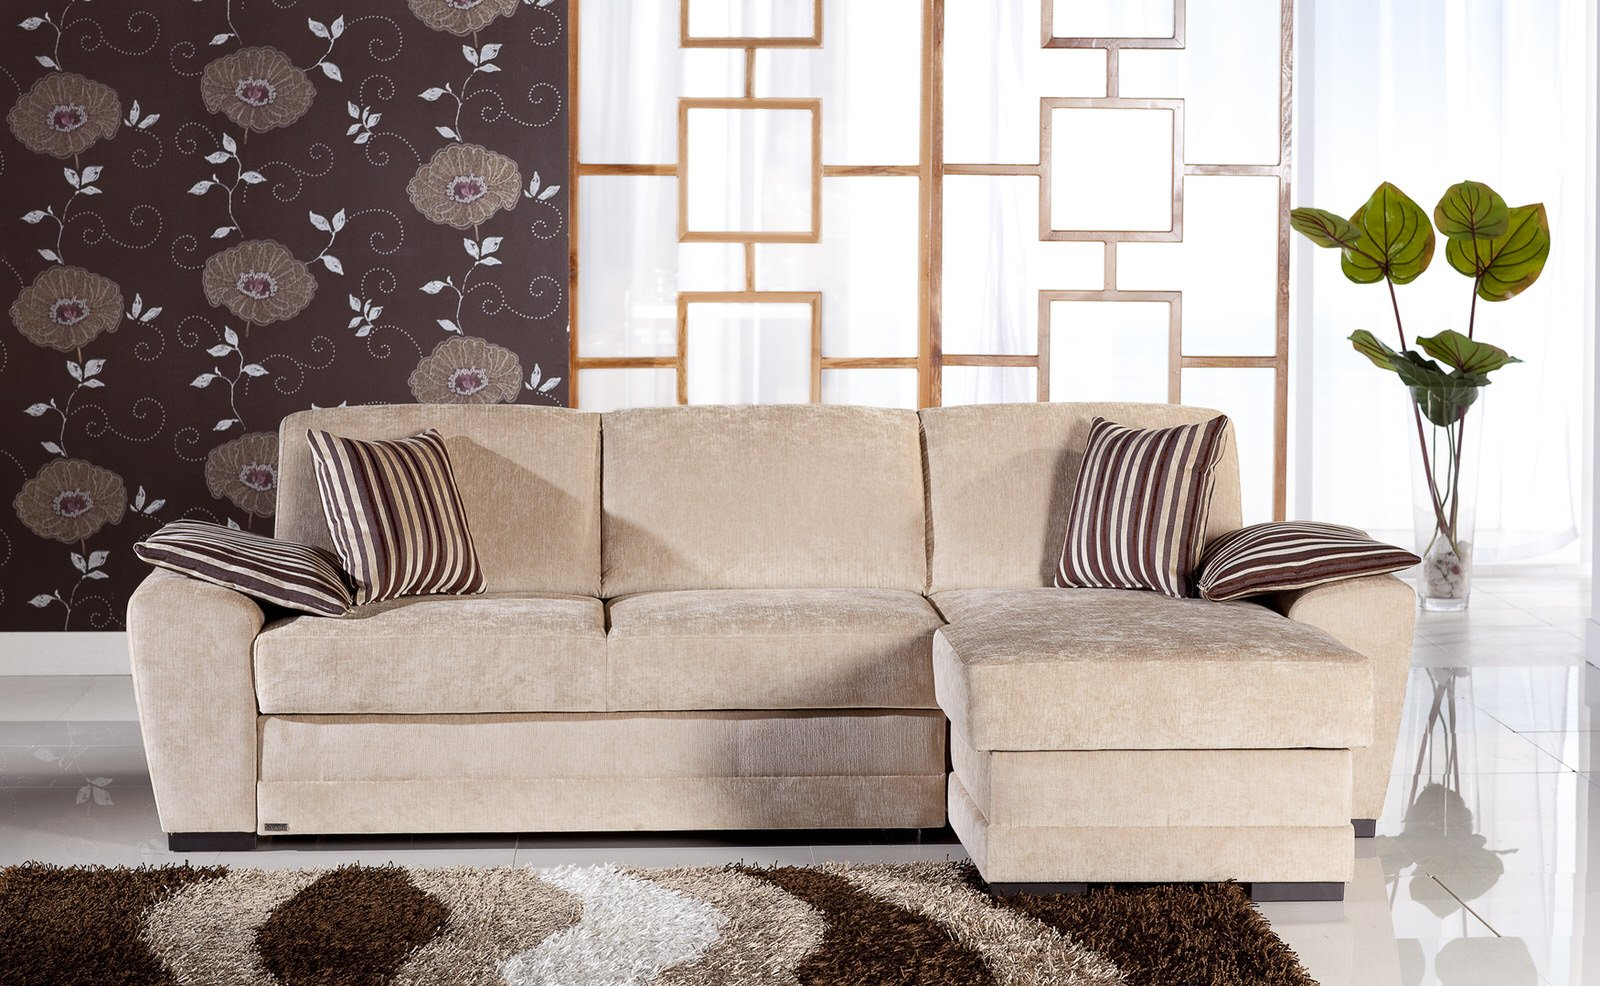 Comfort Sleeper Sectionals Rom Atria Sleeper Sectional Sofa – Sectional Sofa Sleeper Bed